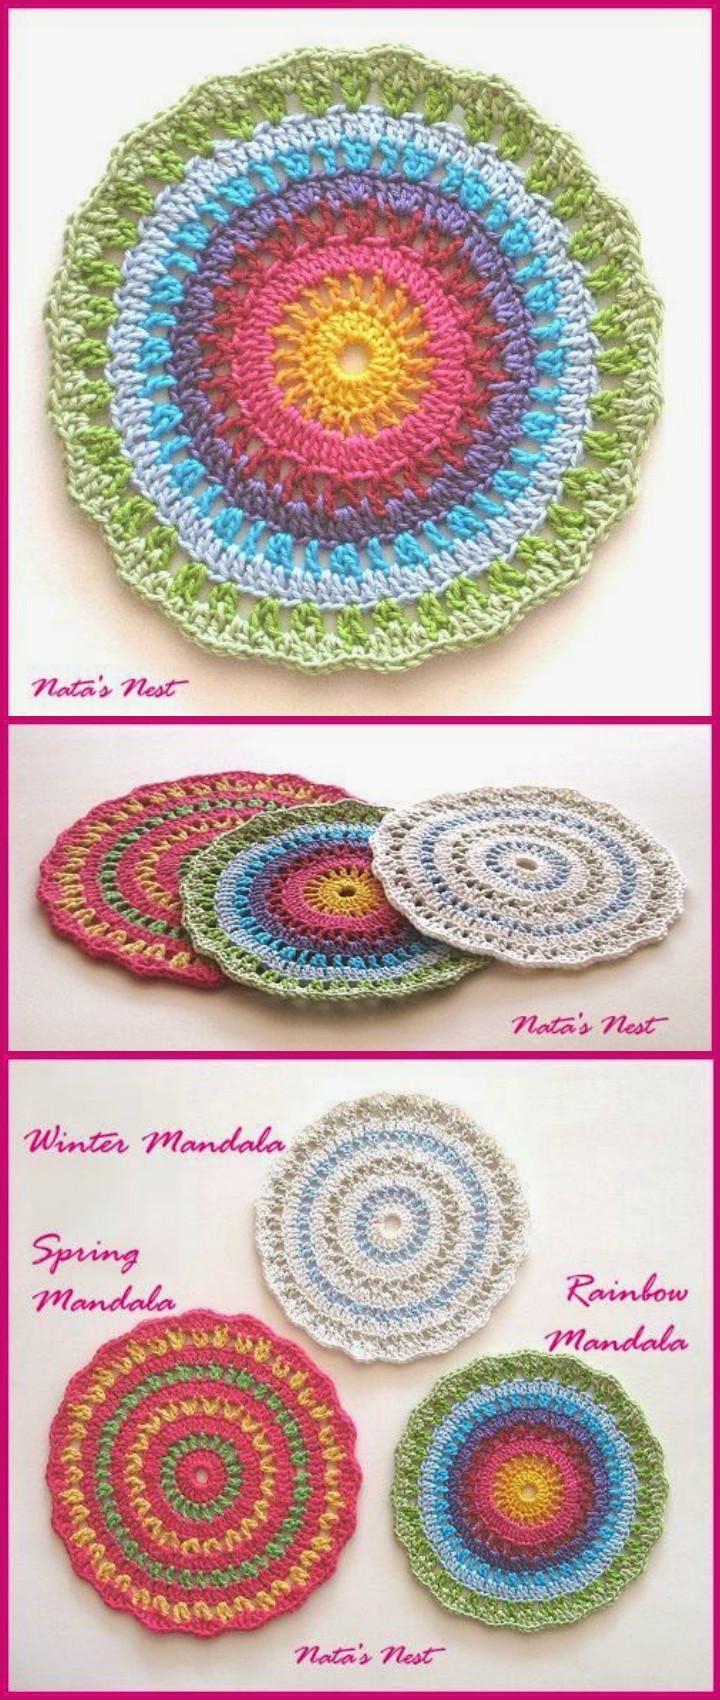 60+ Free Crochet Mandala Patterns - Page 6 of 12 - DIY & Crafts ...